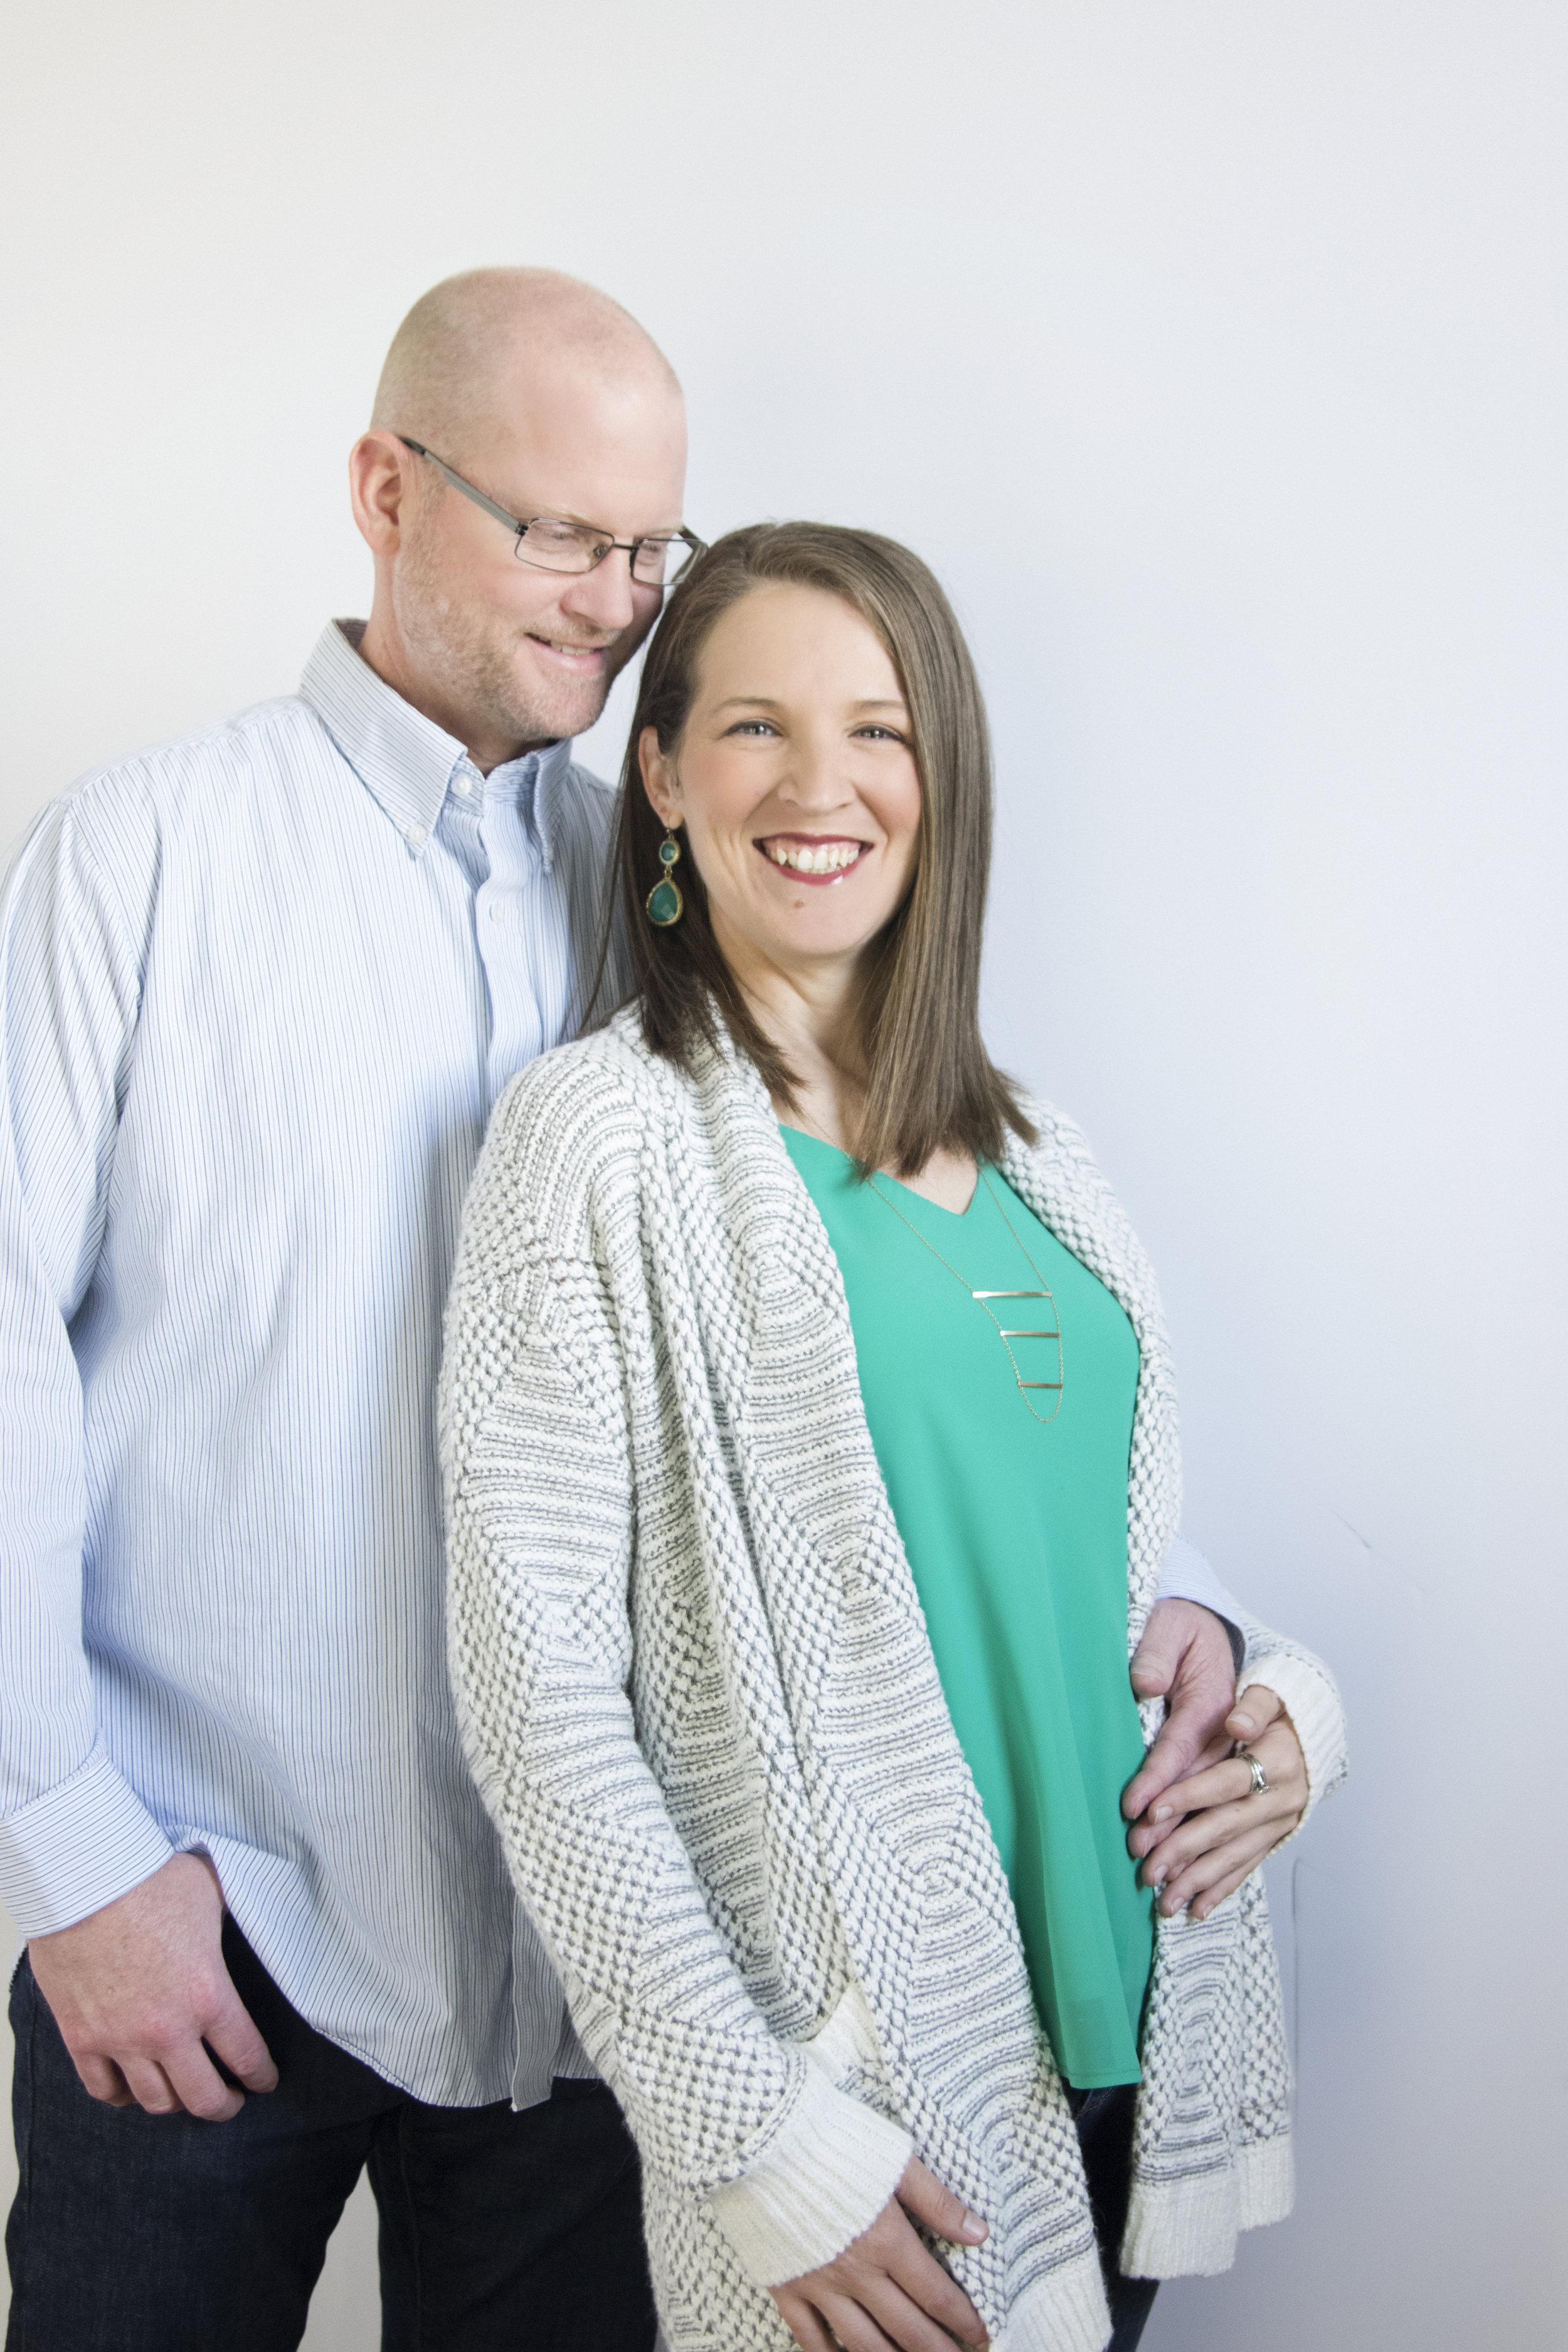 Heirloom Family Portraits